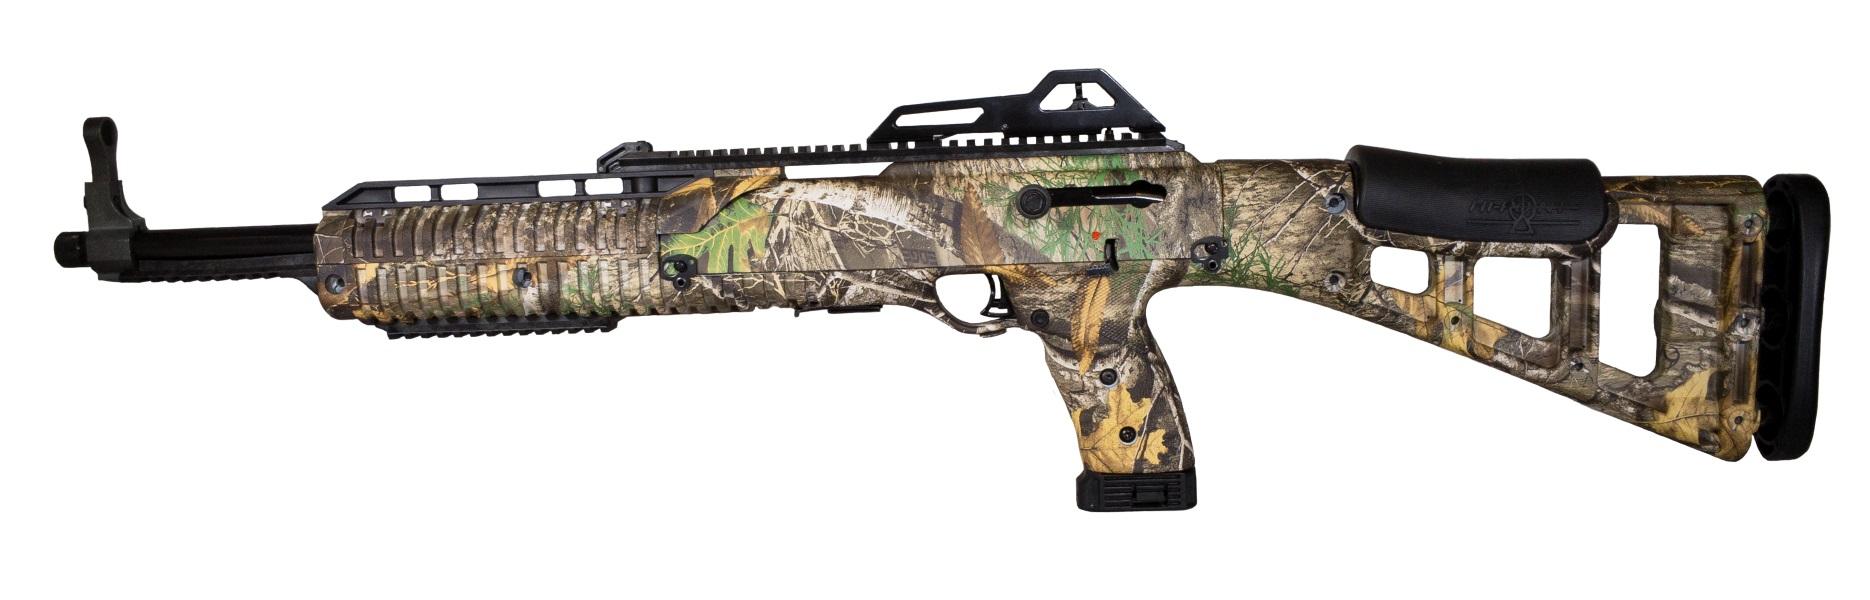 Hi-Point 10TS Carbine 10mm